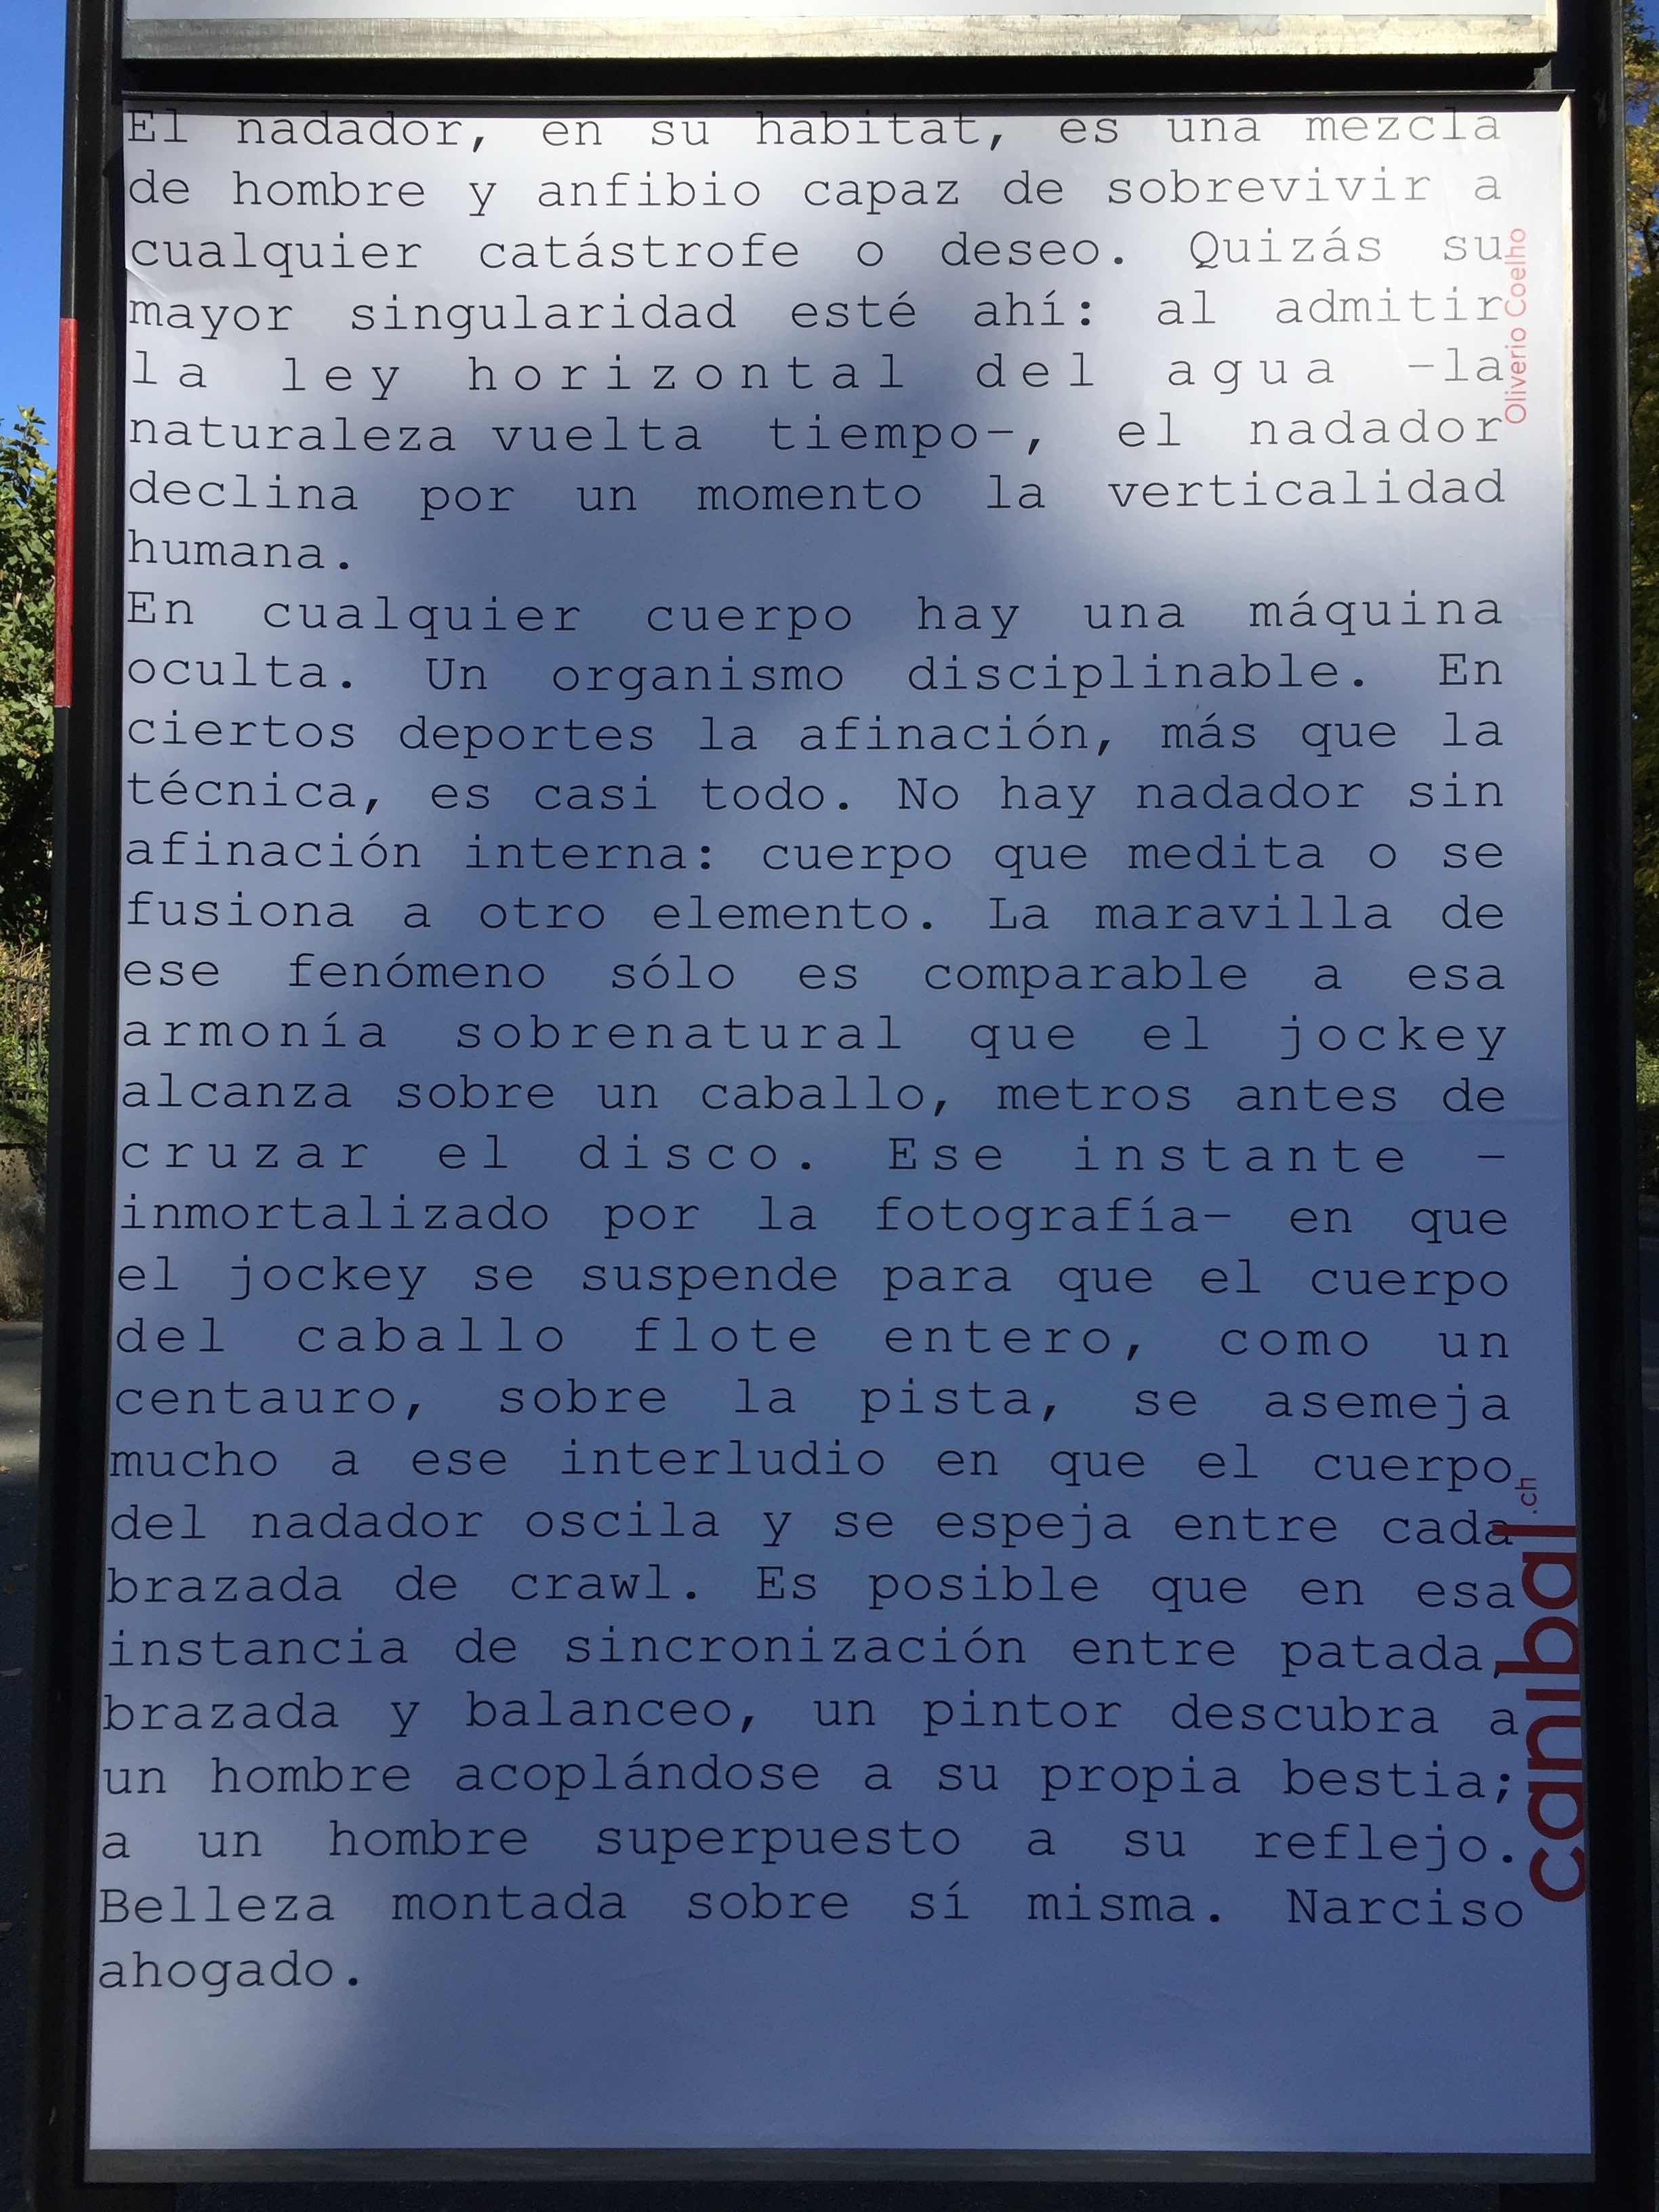 Oliverio Coelho, avenue de milan 10, Lausanne-IMG_5833